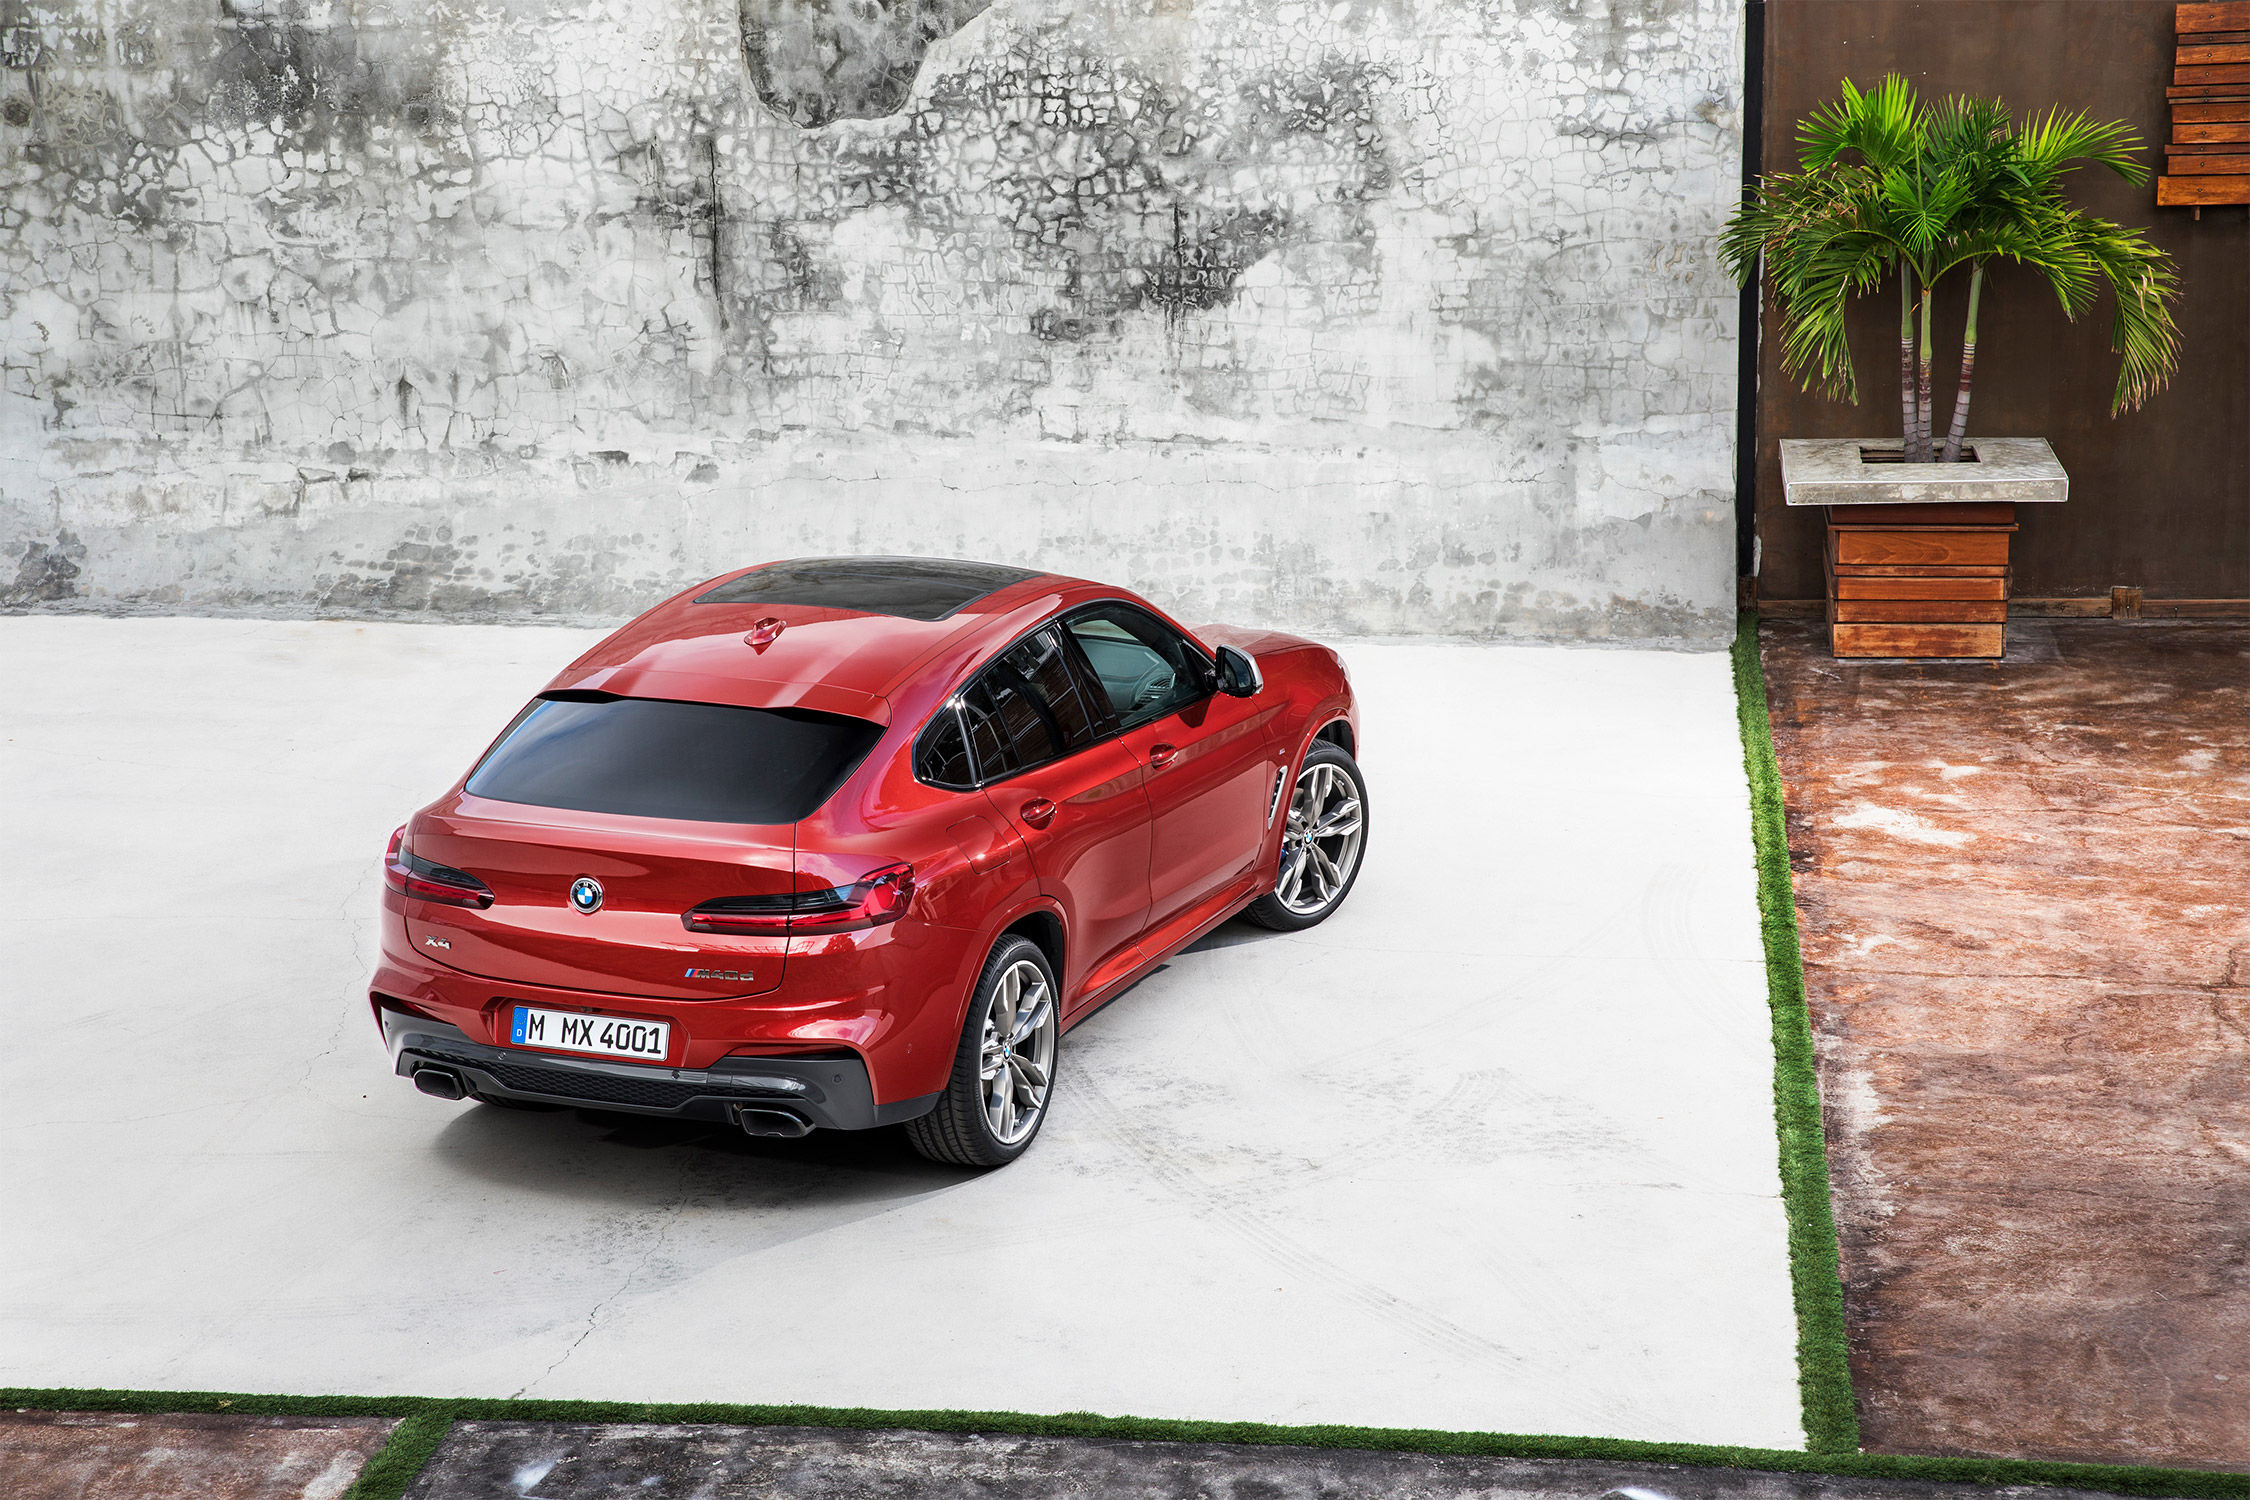 bmw x4 sport et style actualit automobile motorlegend. Black Bedroom Furniture Sets. Home Design Ideas